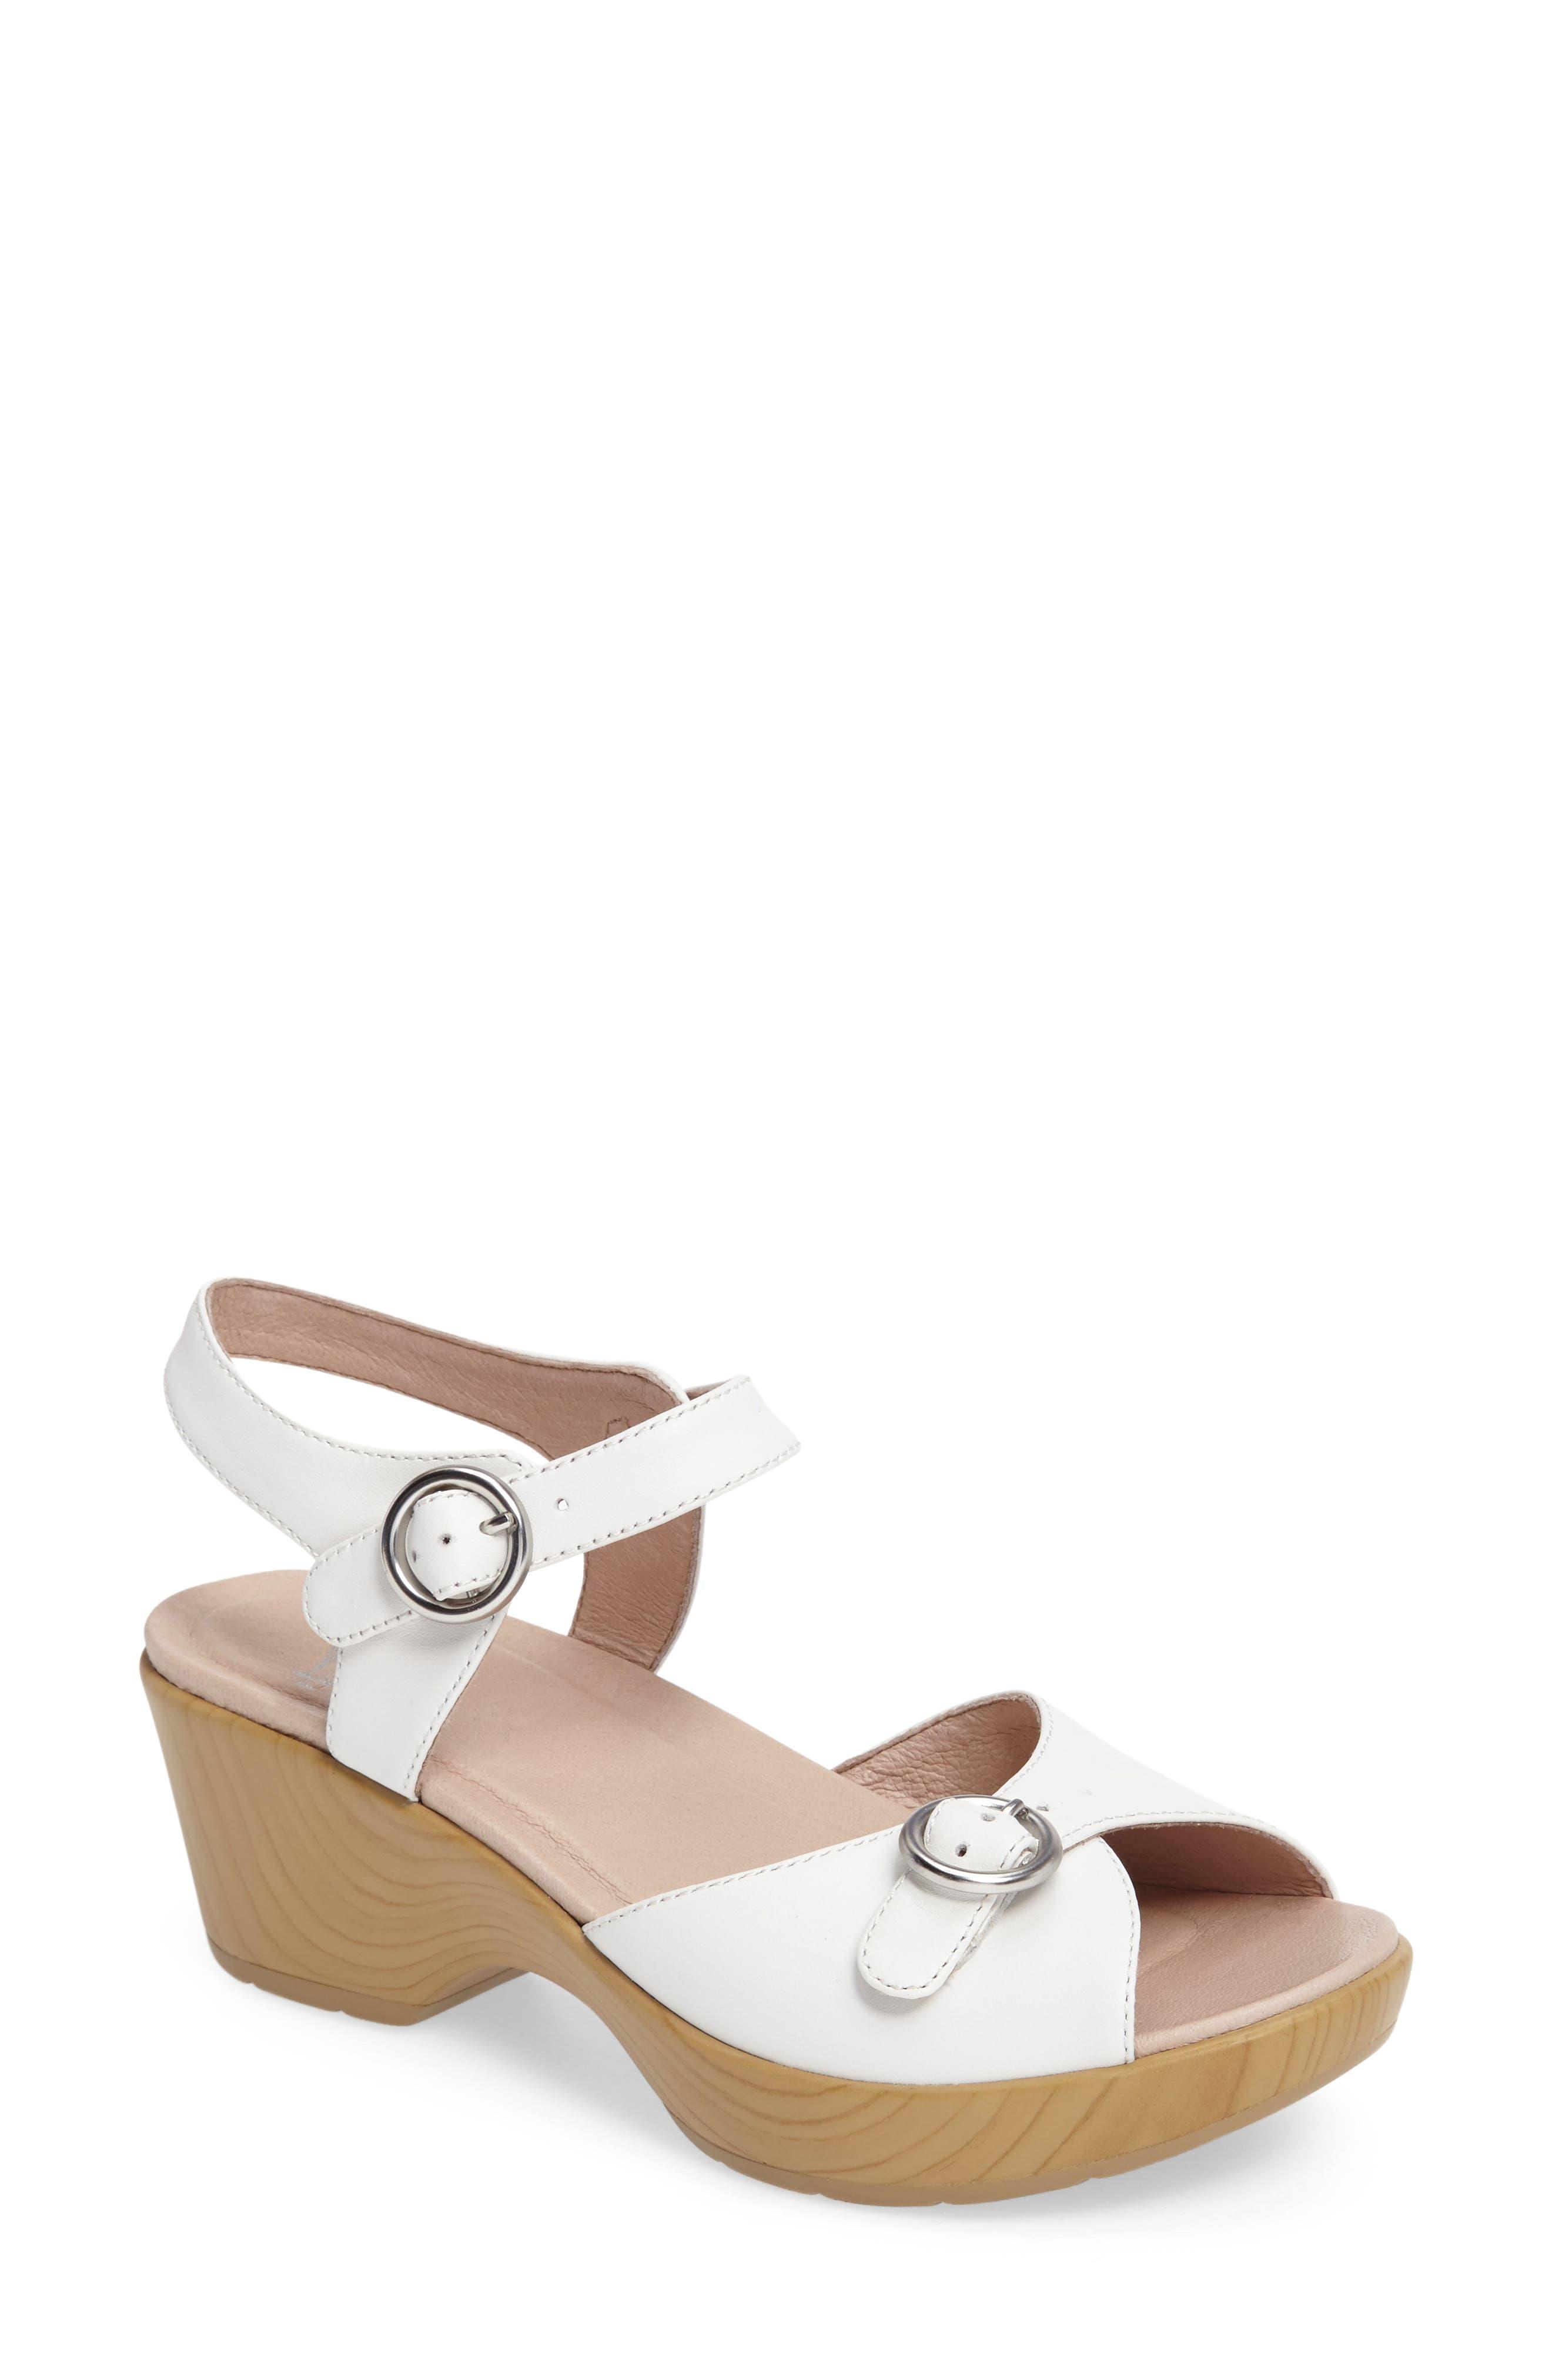 June Platform Sandal,                         Main,                         color, White Leather